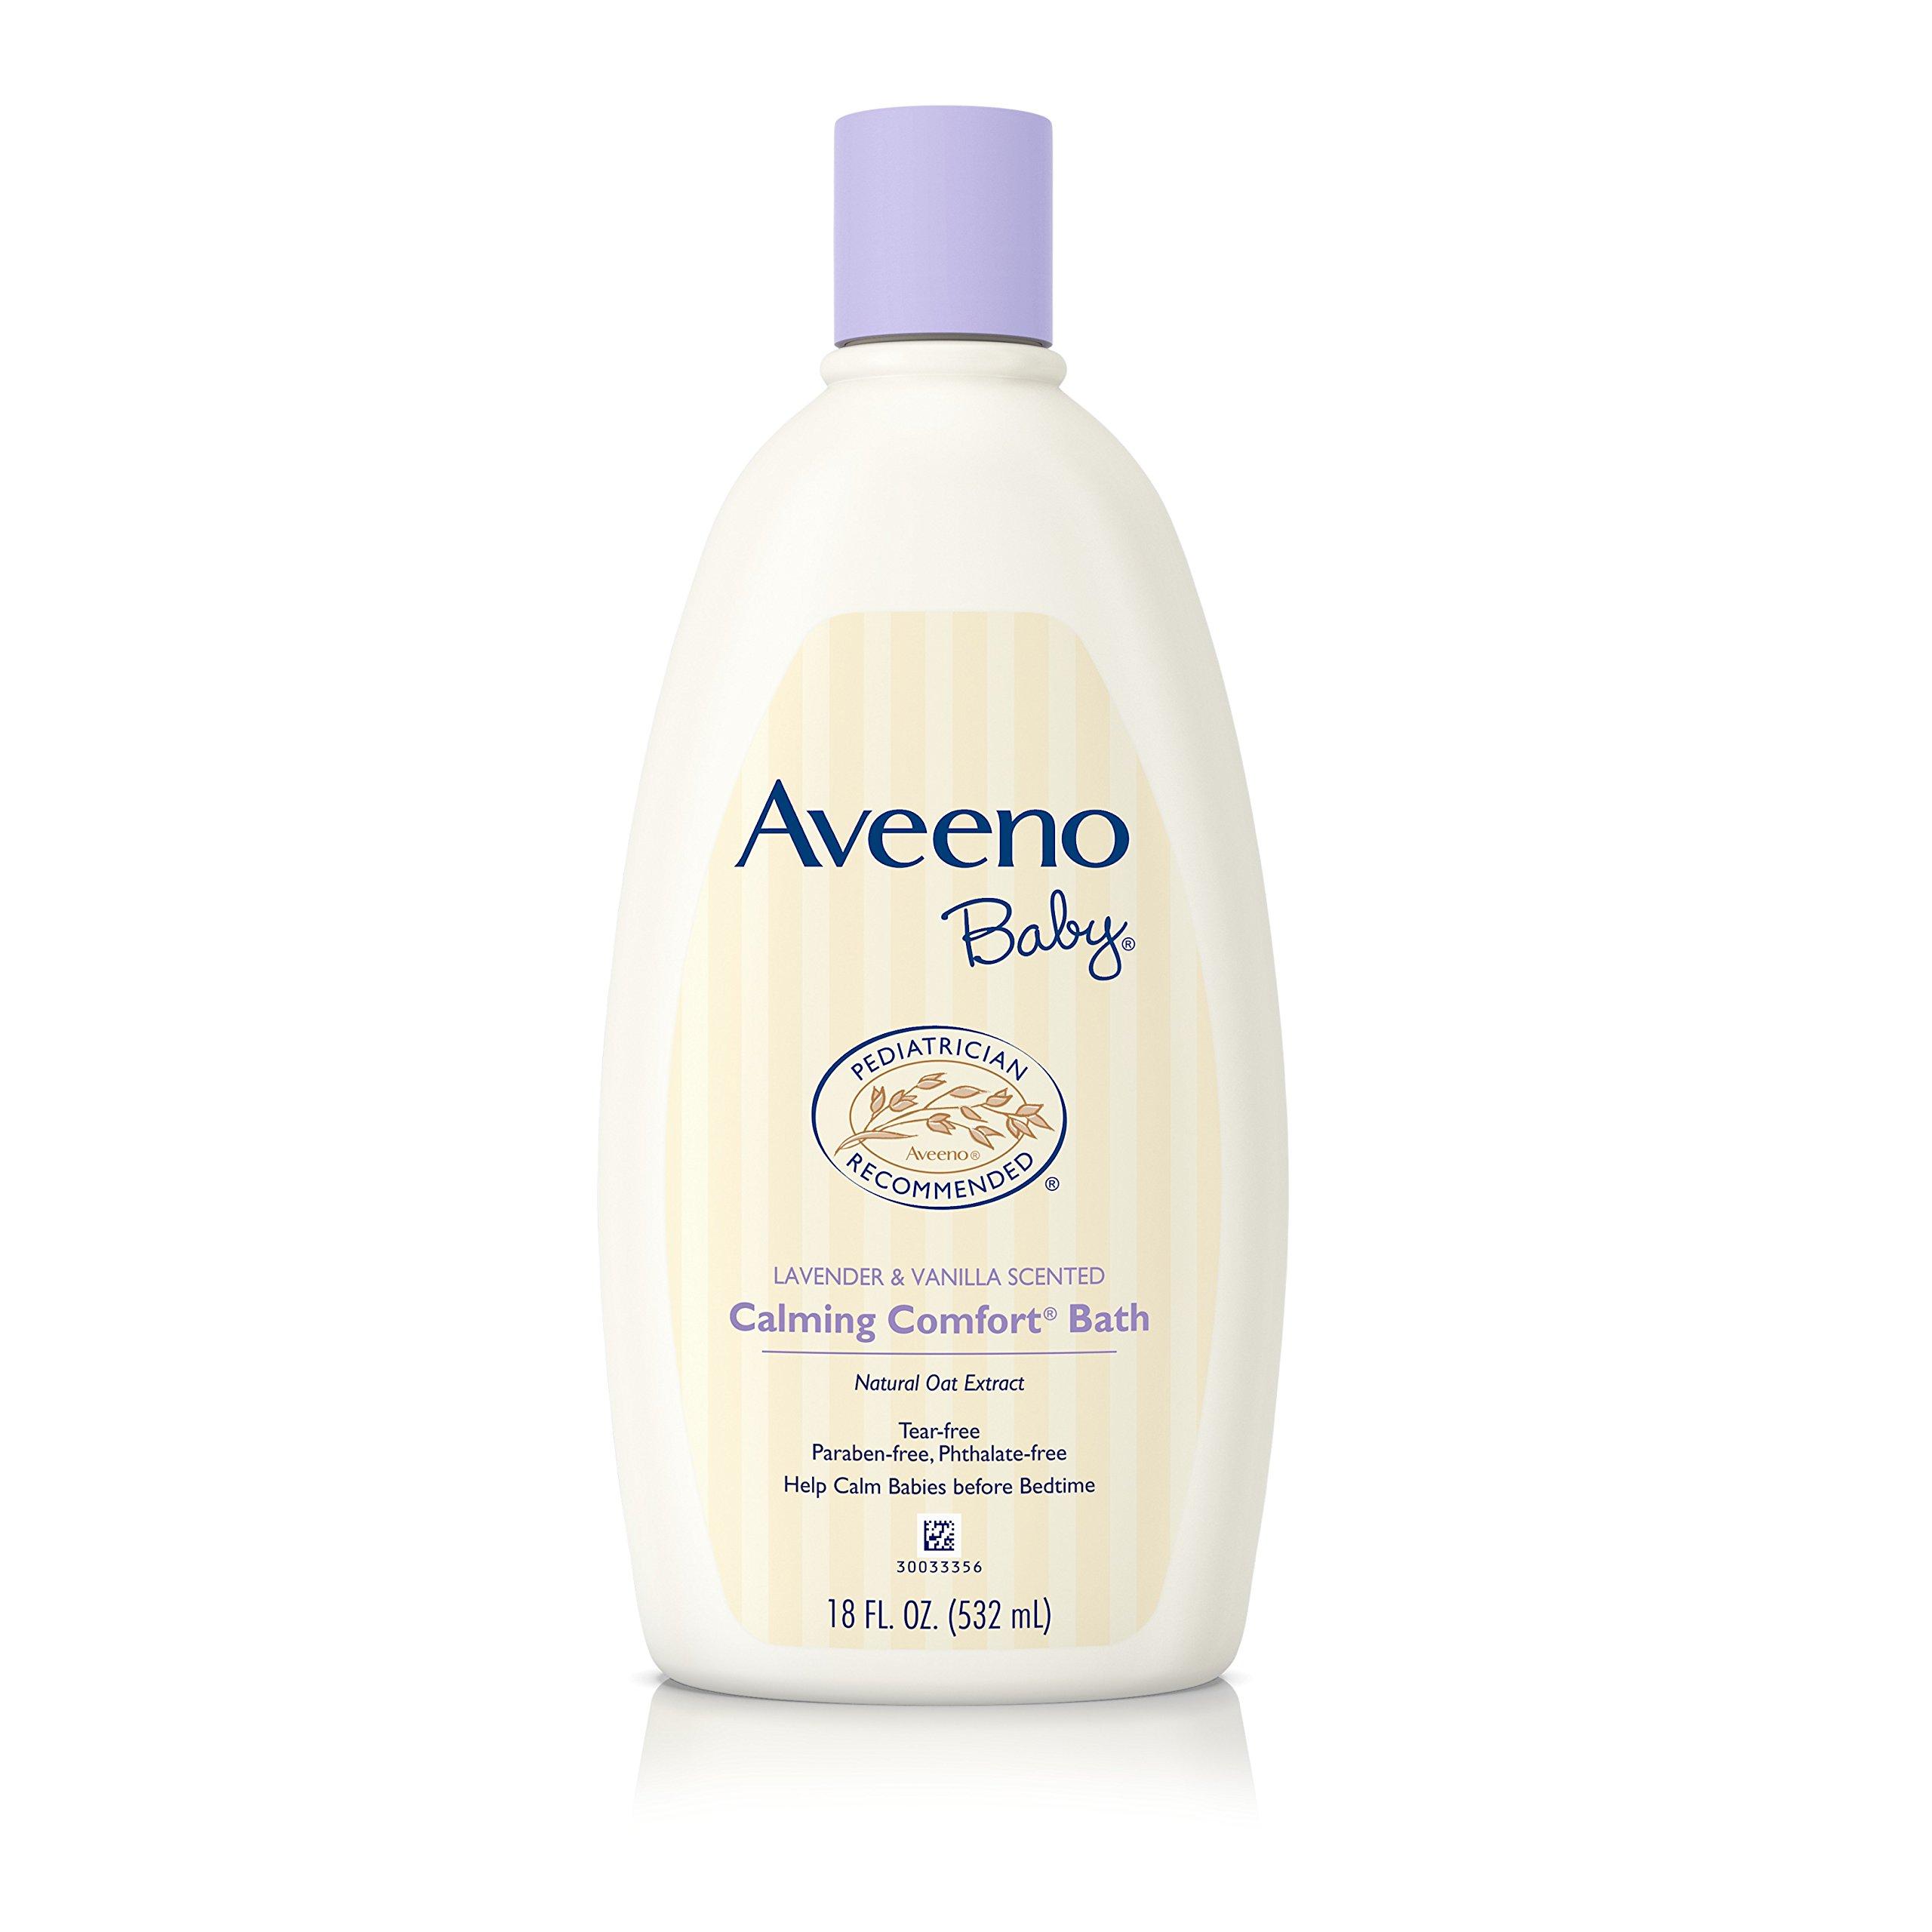 Aveeno Baby Calming Comfort Bath with Lavender & Vanilla, Hypoallergenic & Tear-Free, 18 fl. oz